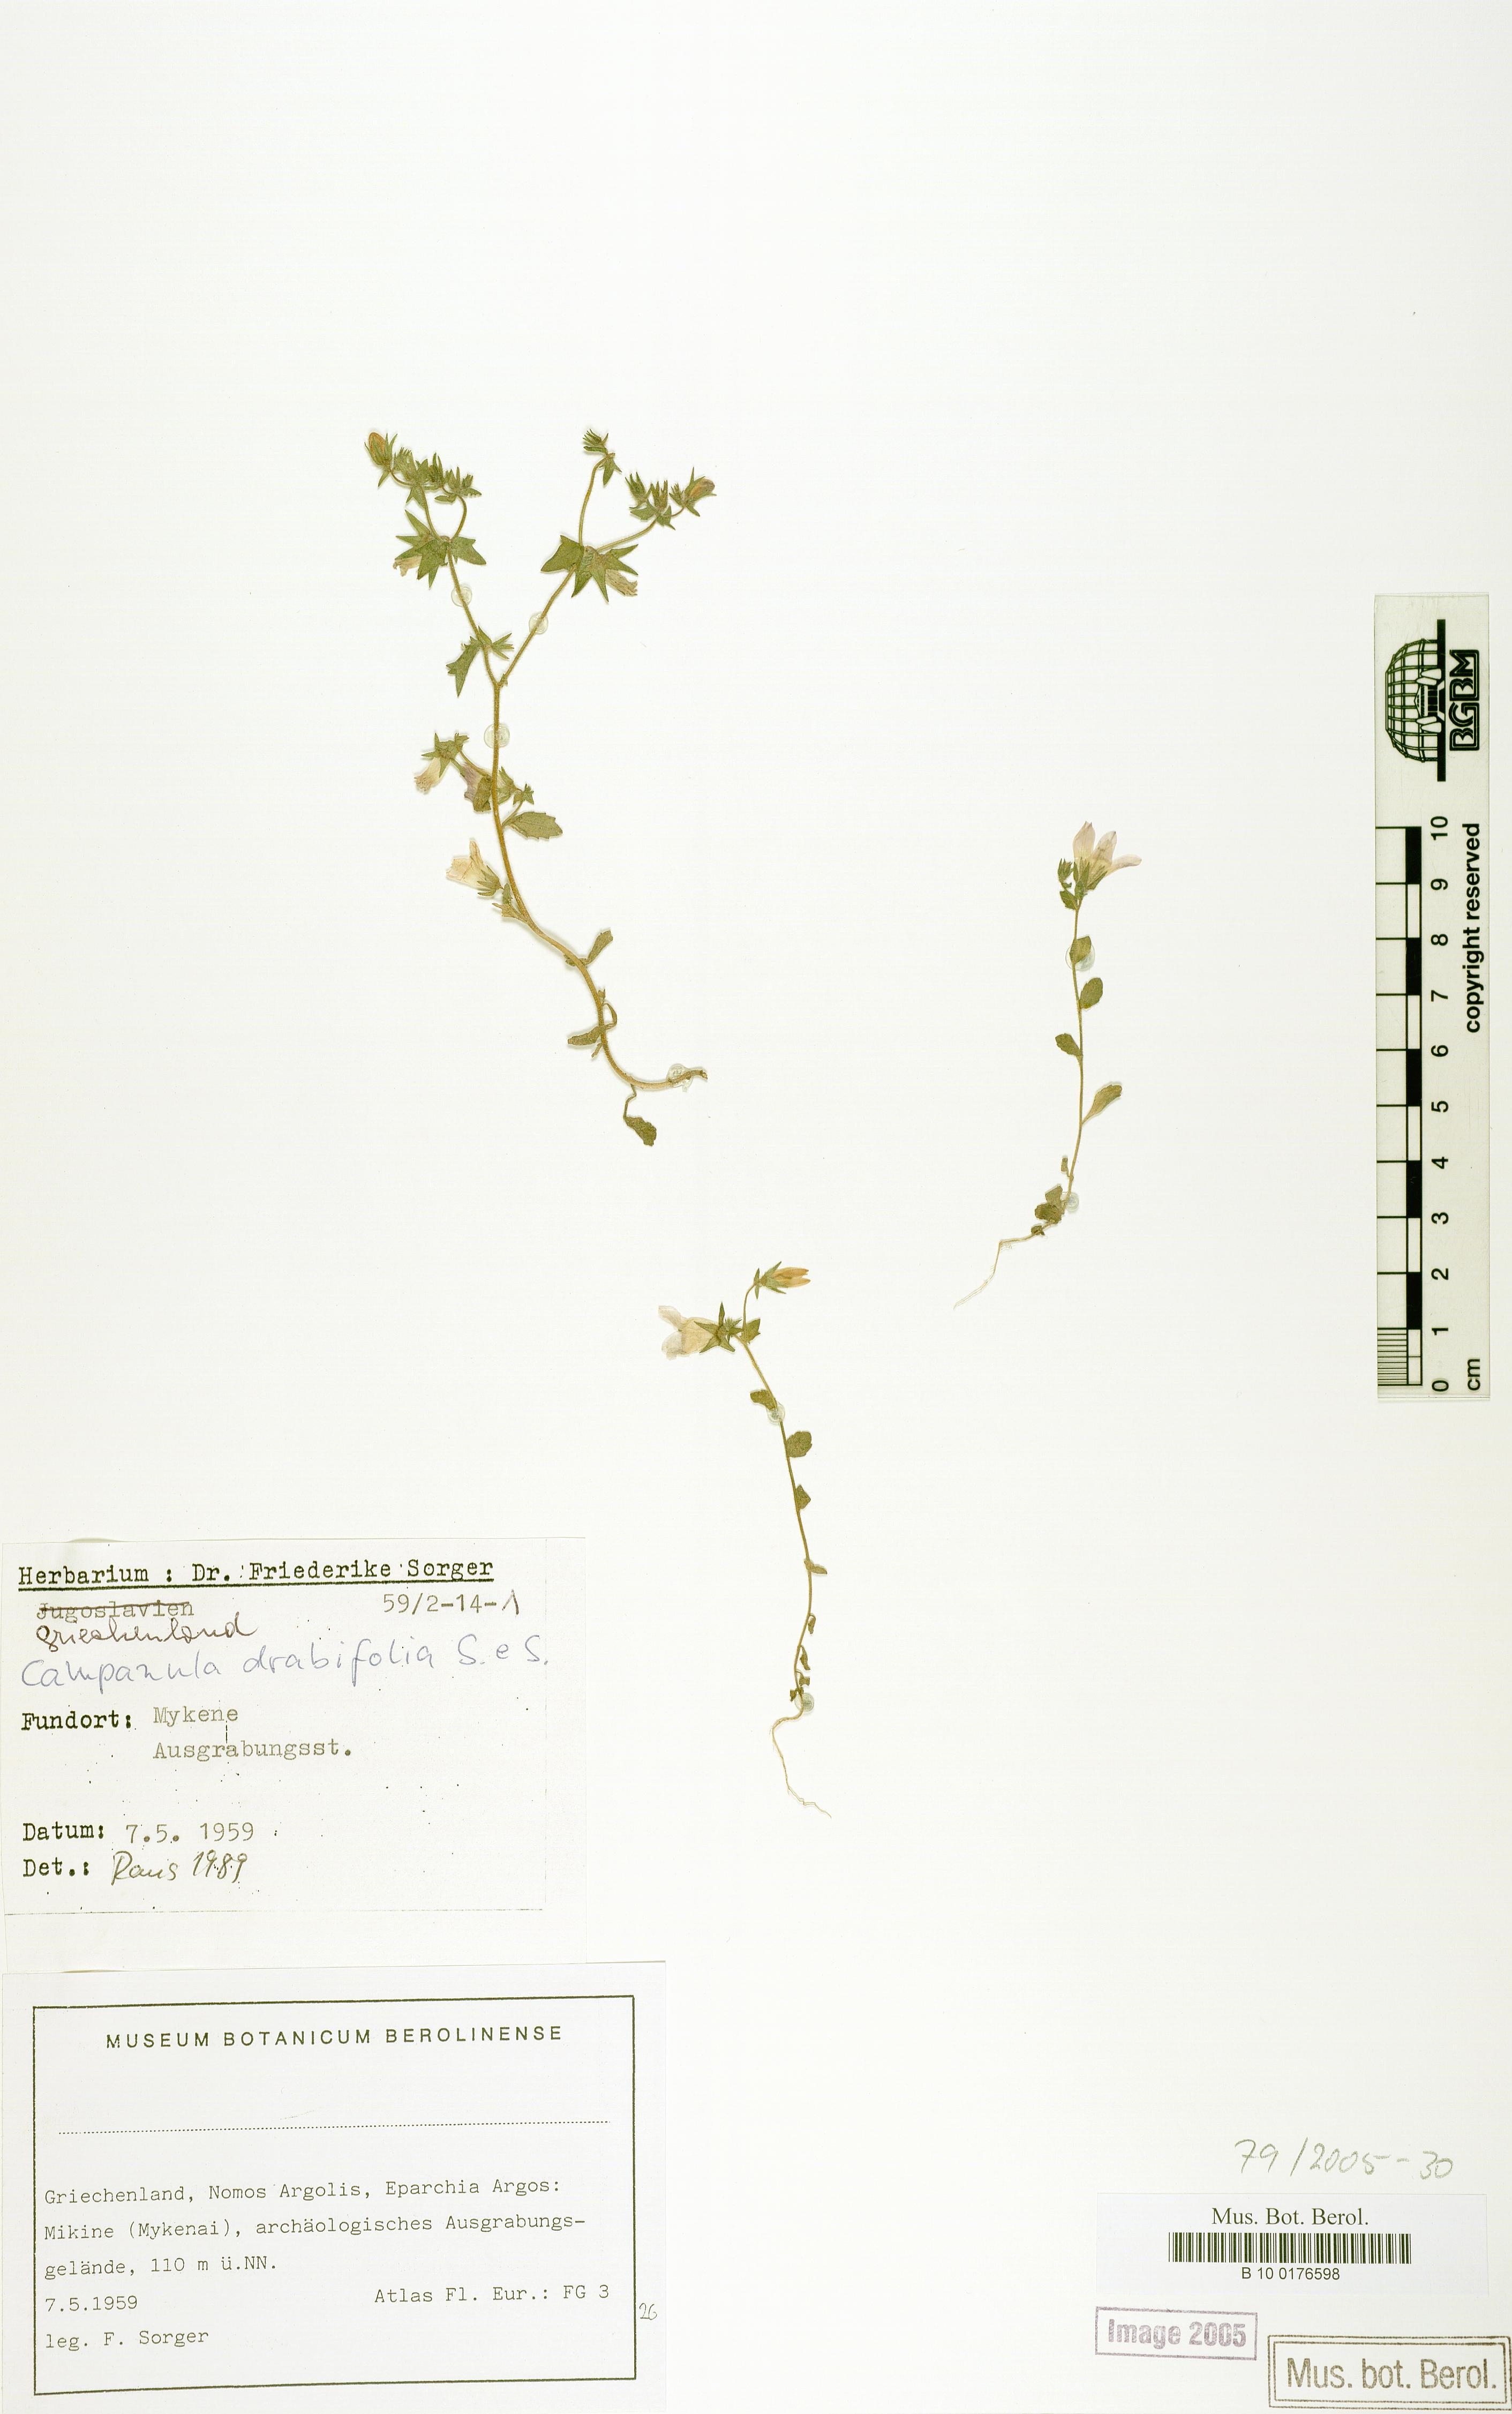 http://ww2.bgbm.org/herbarium/images/B/10/01/76/59/B_10_0176598.jpg